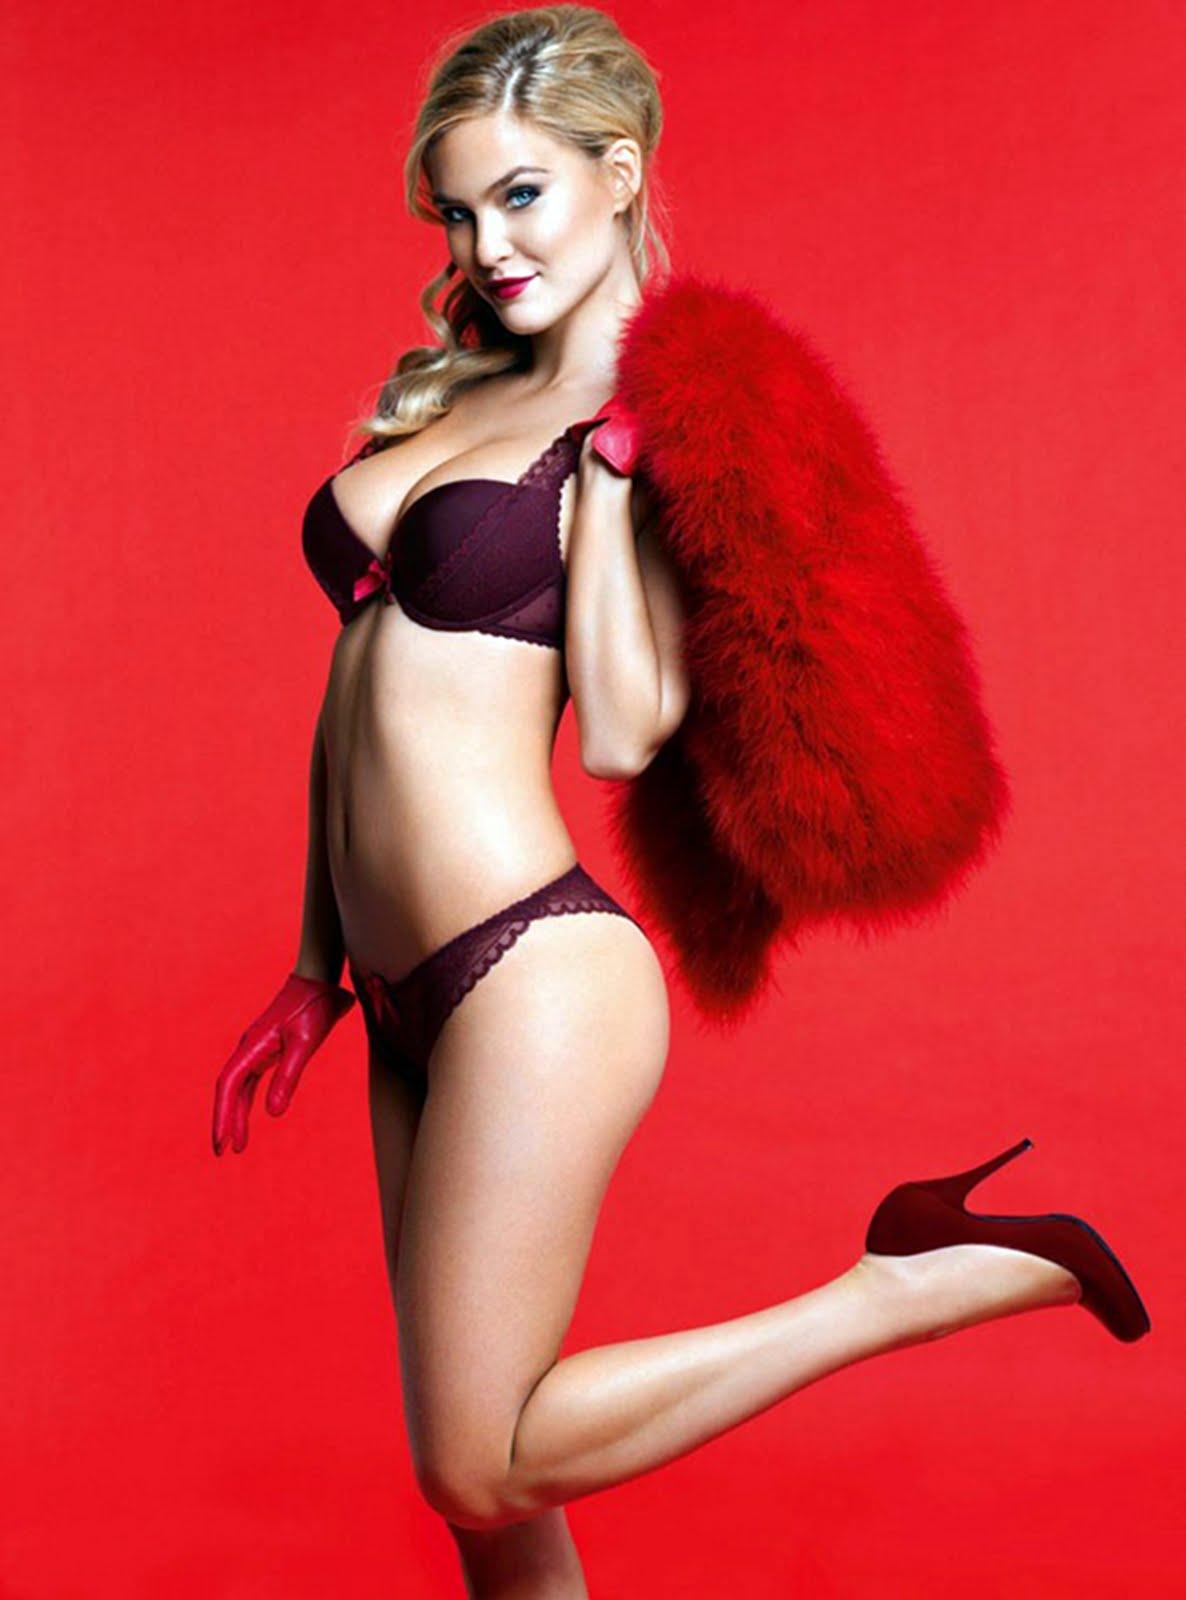 Celebrity Angelika Jakubowska nude (67 foto and video), Pussy, Leaked, Boobs, in bikini 2020